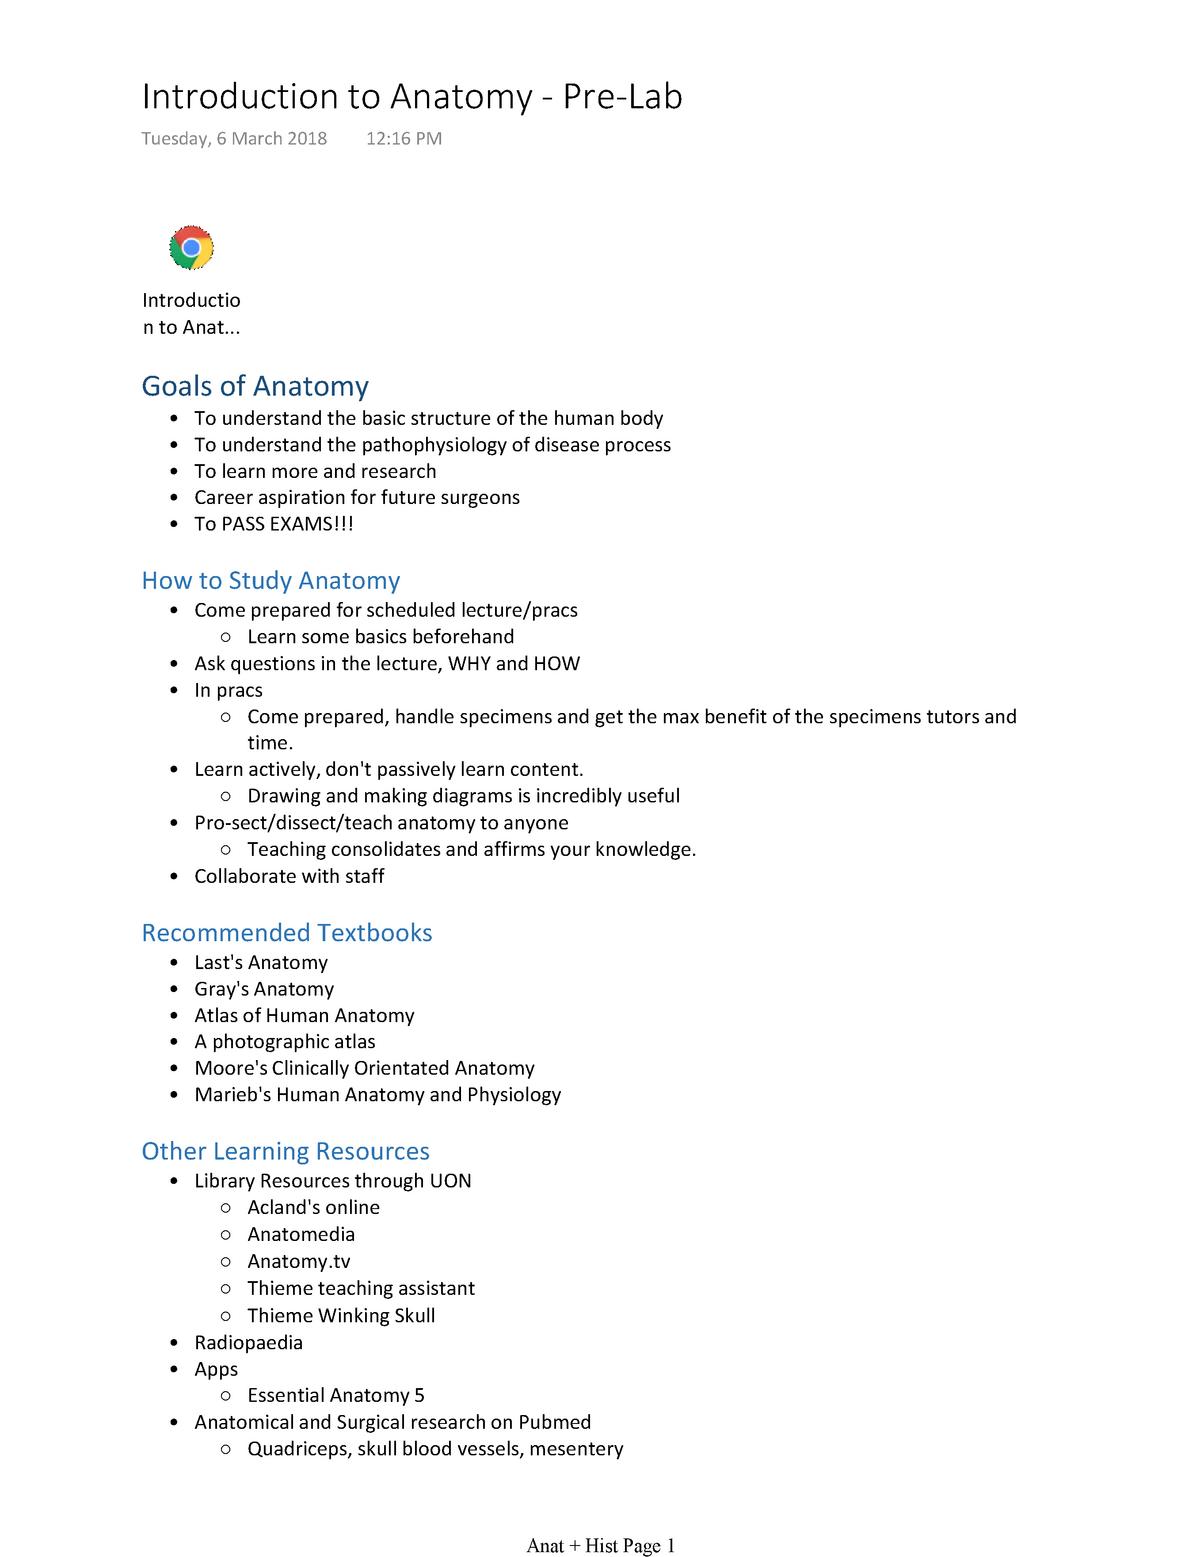 Introduction to Anatomy - Pre-Lab - MEDI1101A: Medicine